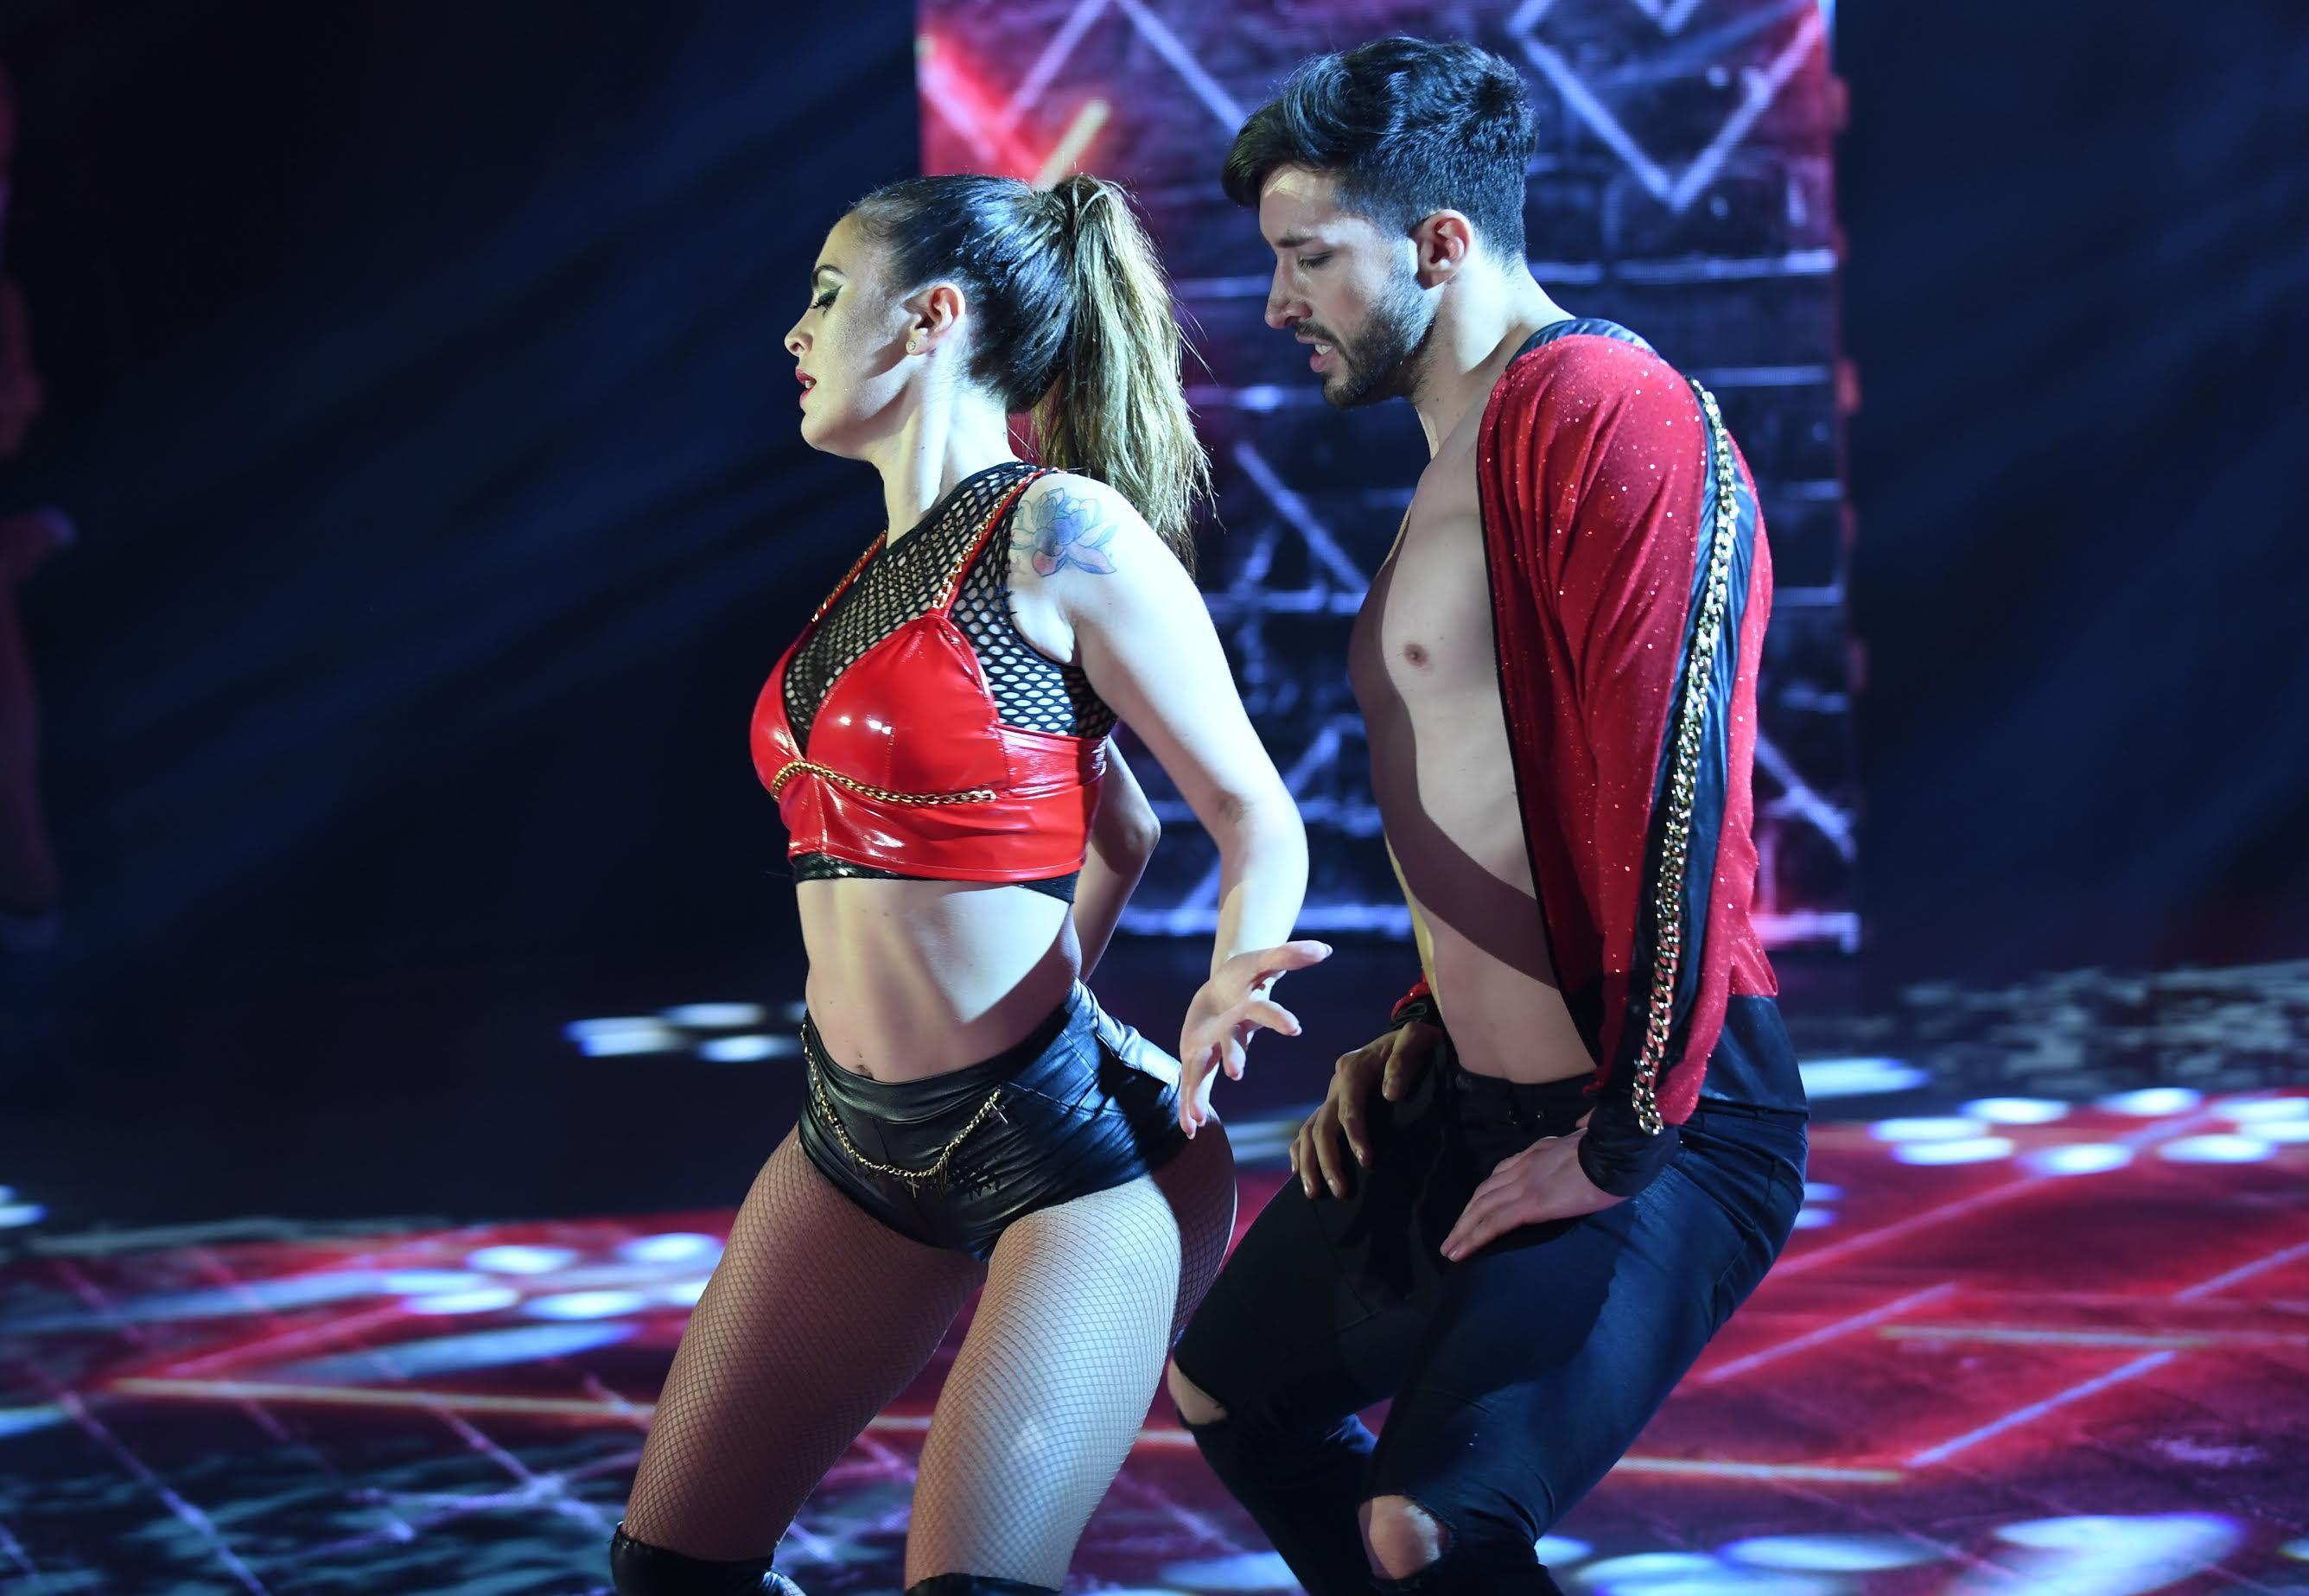 Silvina Luna con Leandro Nimo bailaron reggaetón romántico